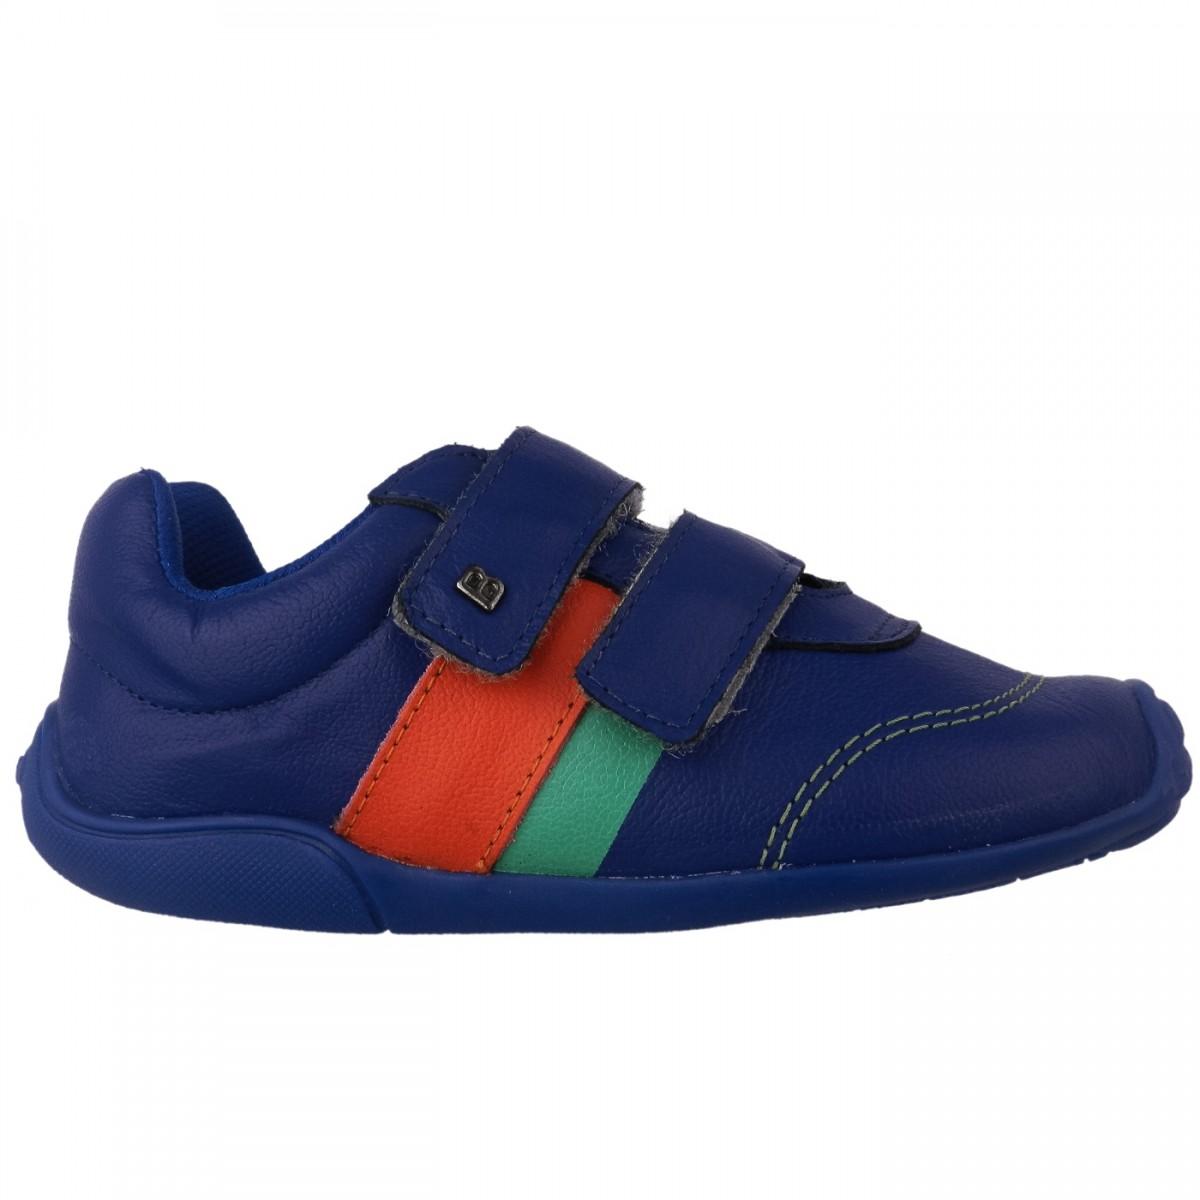 711e206bc Bizz Store - Tênis Infantil Menino Bibi Fisioflex New Azul Couro